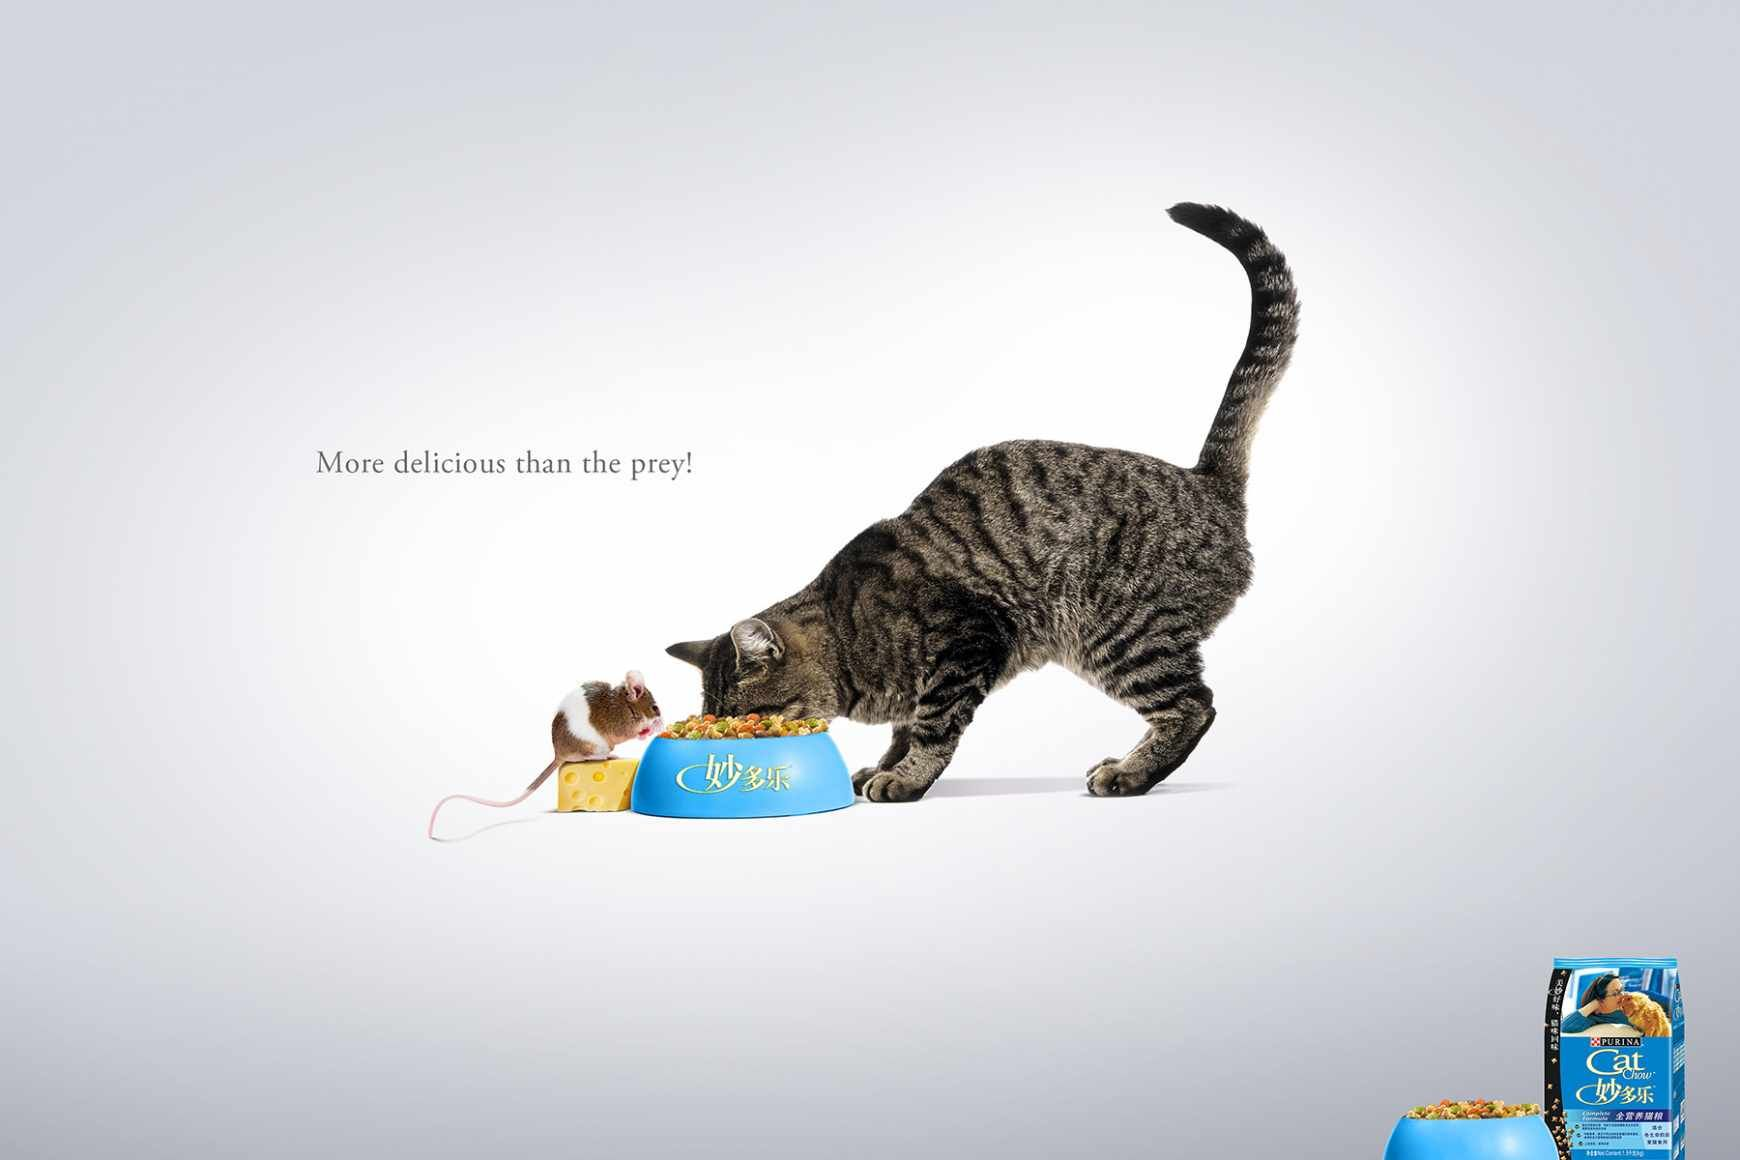 Pin Na Doske Advertising